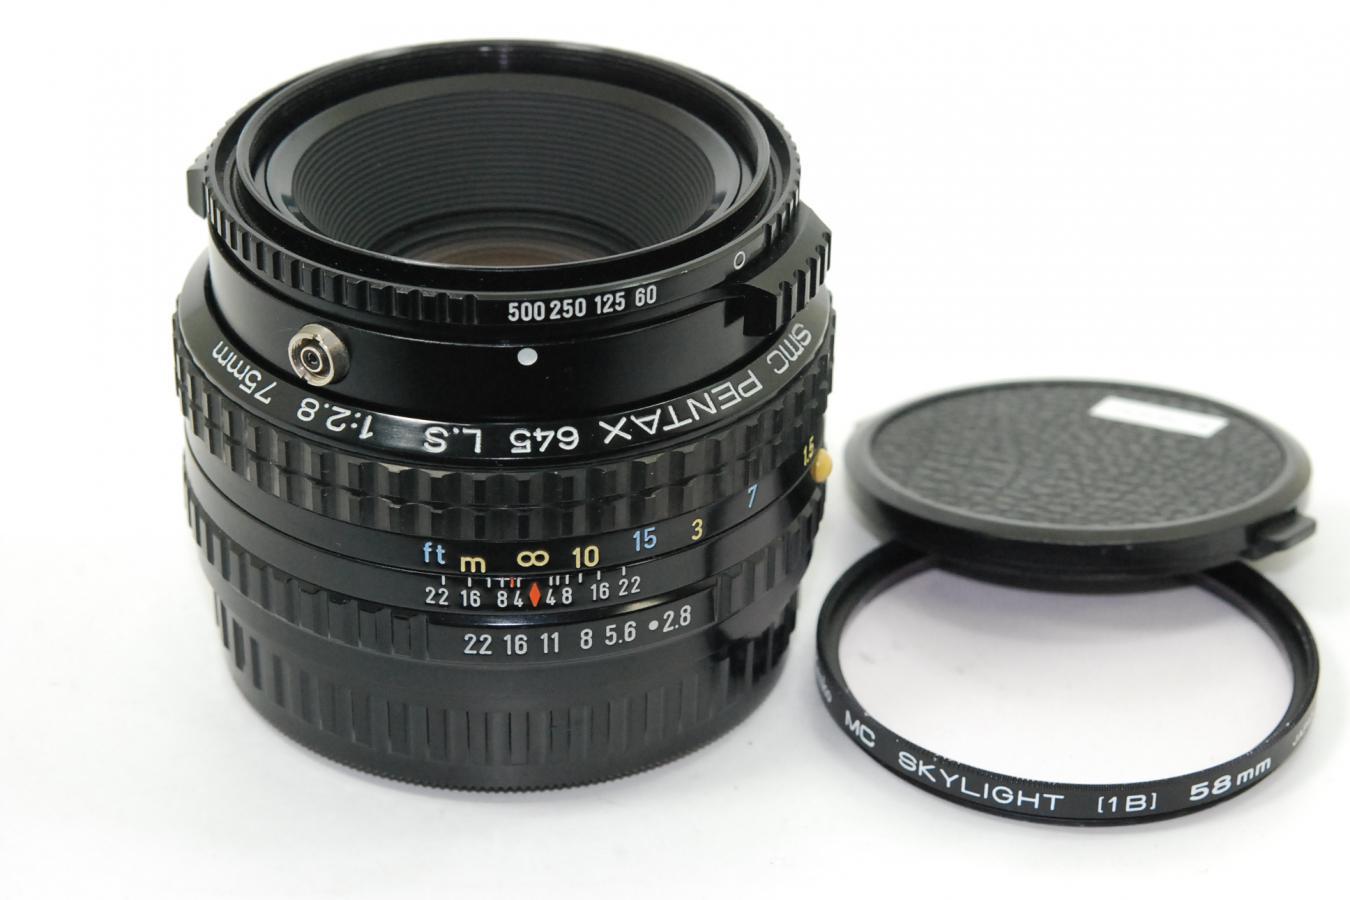 SMC PENTAX 645 L.S 75mm F2.8 【ケンコー製58mmMCスカイライトフィルター付】